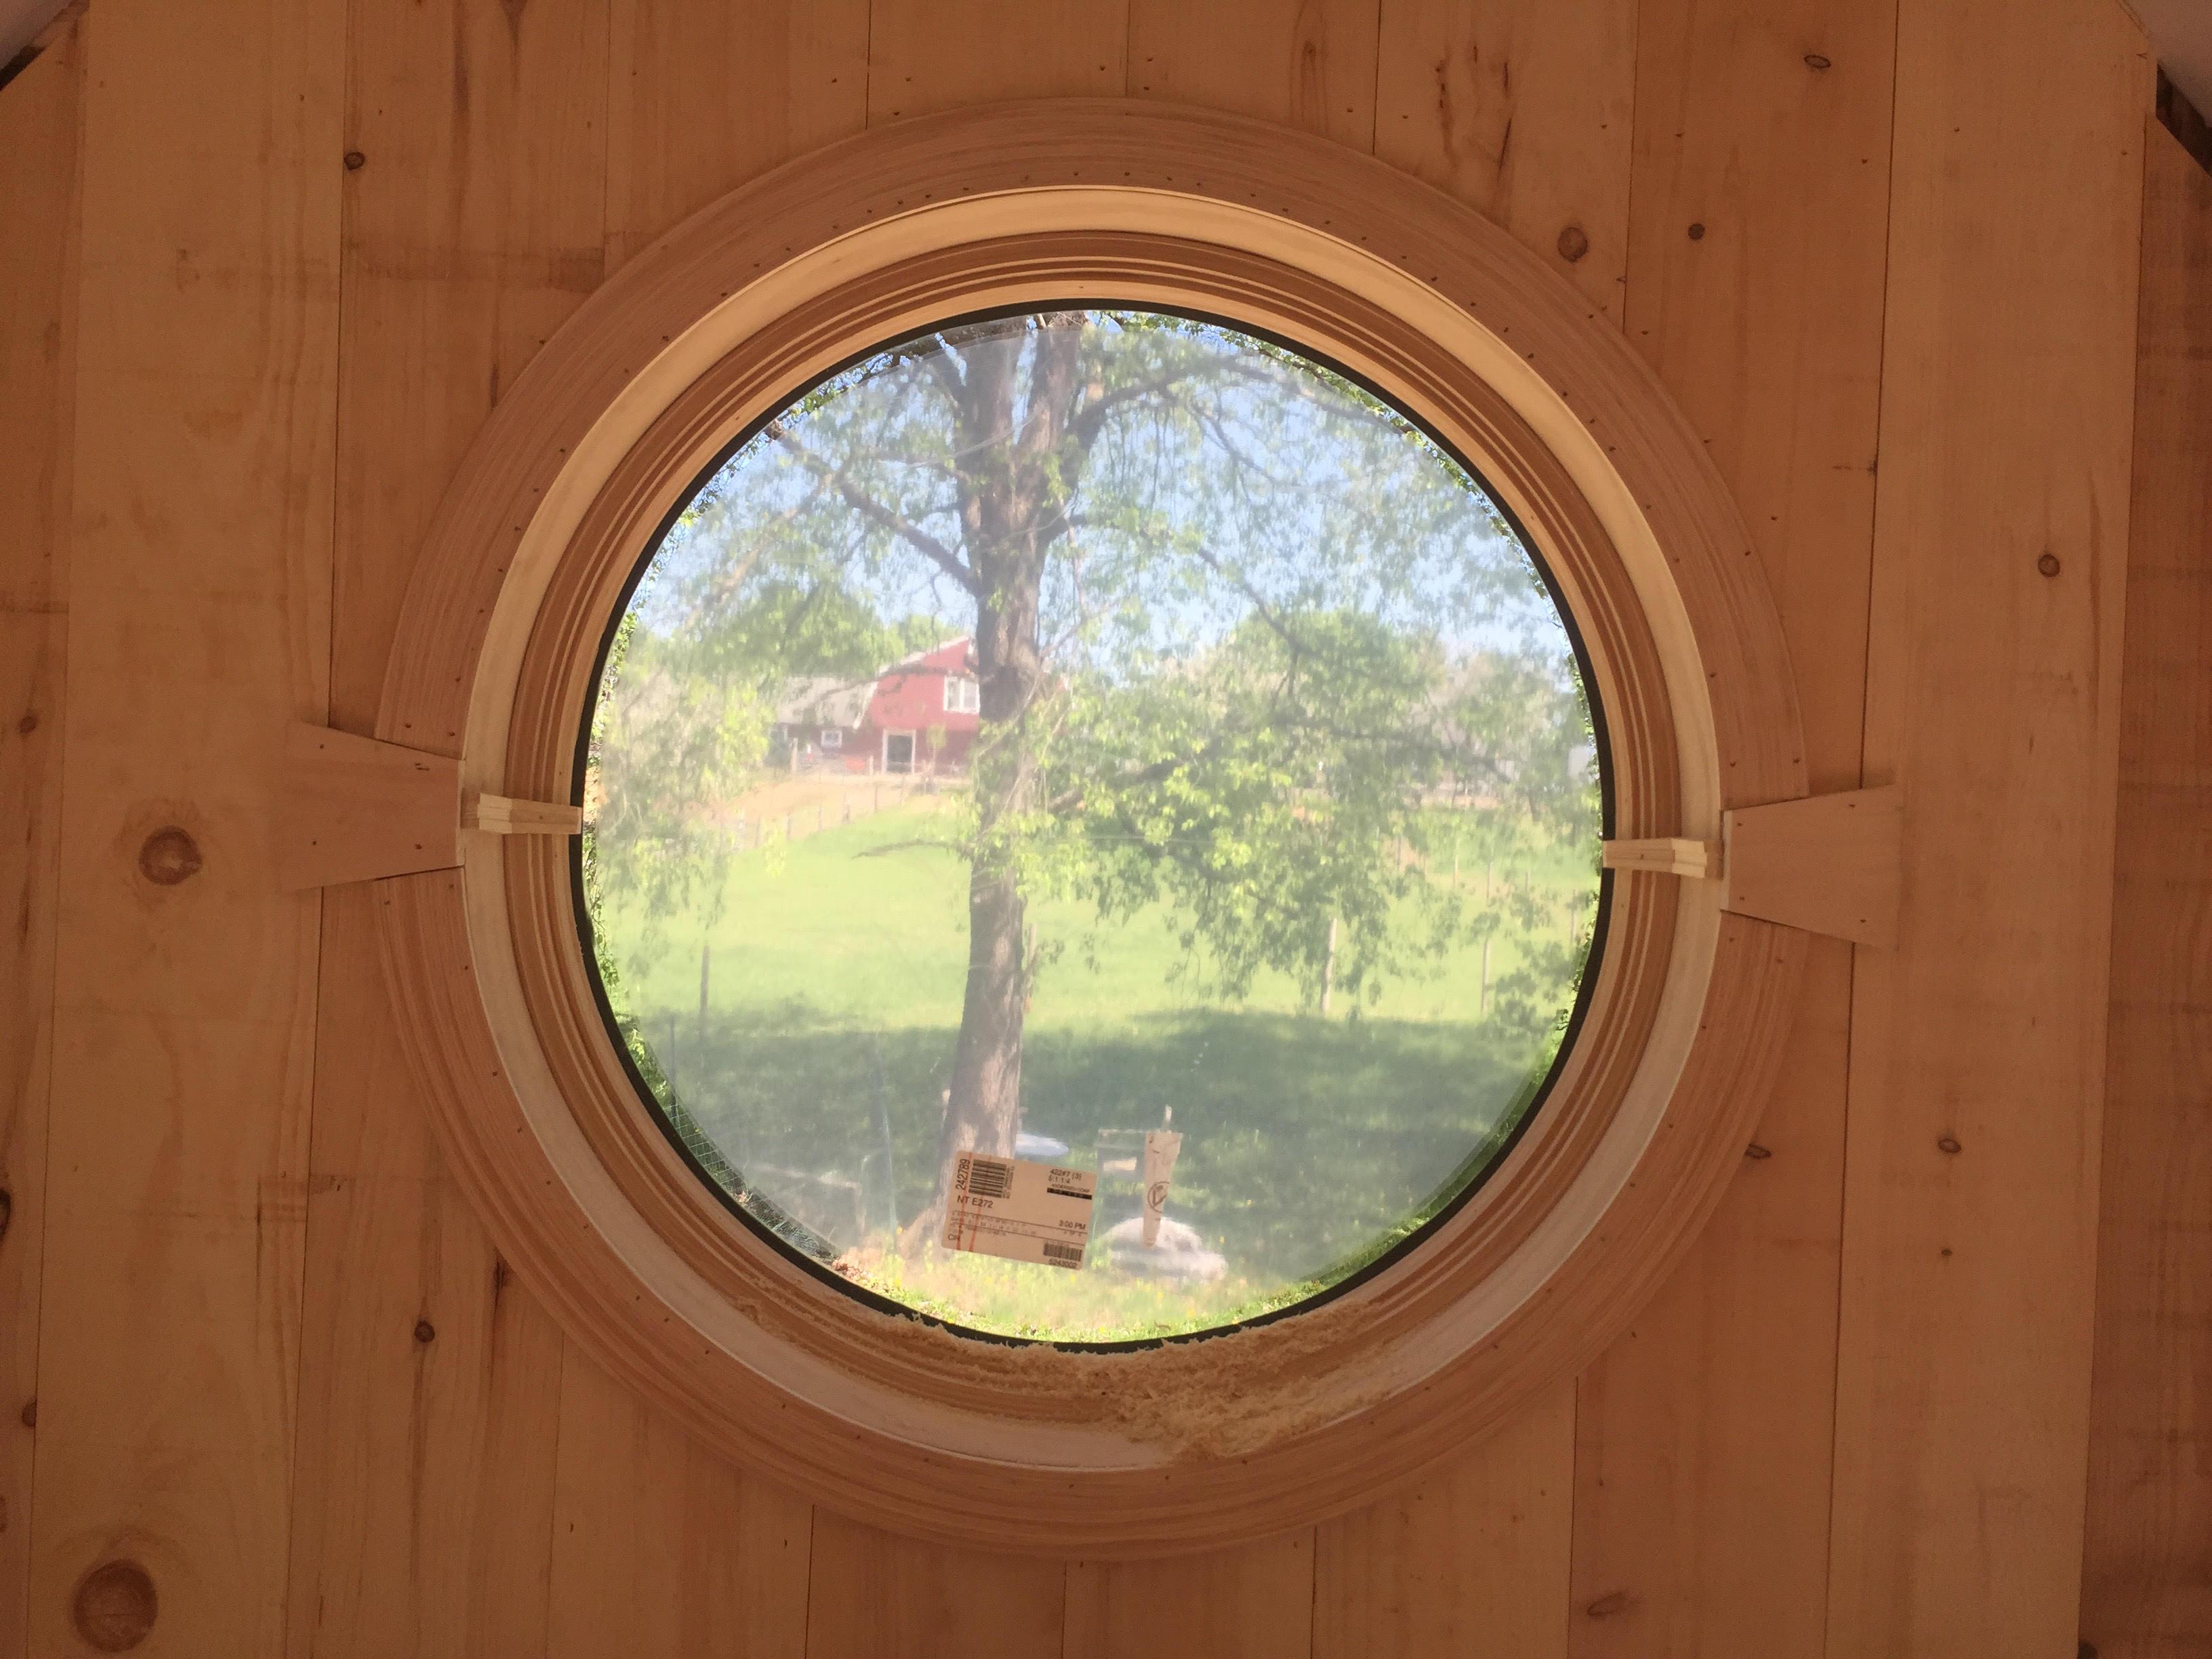 Accessory bld round window w view